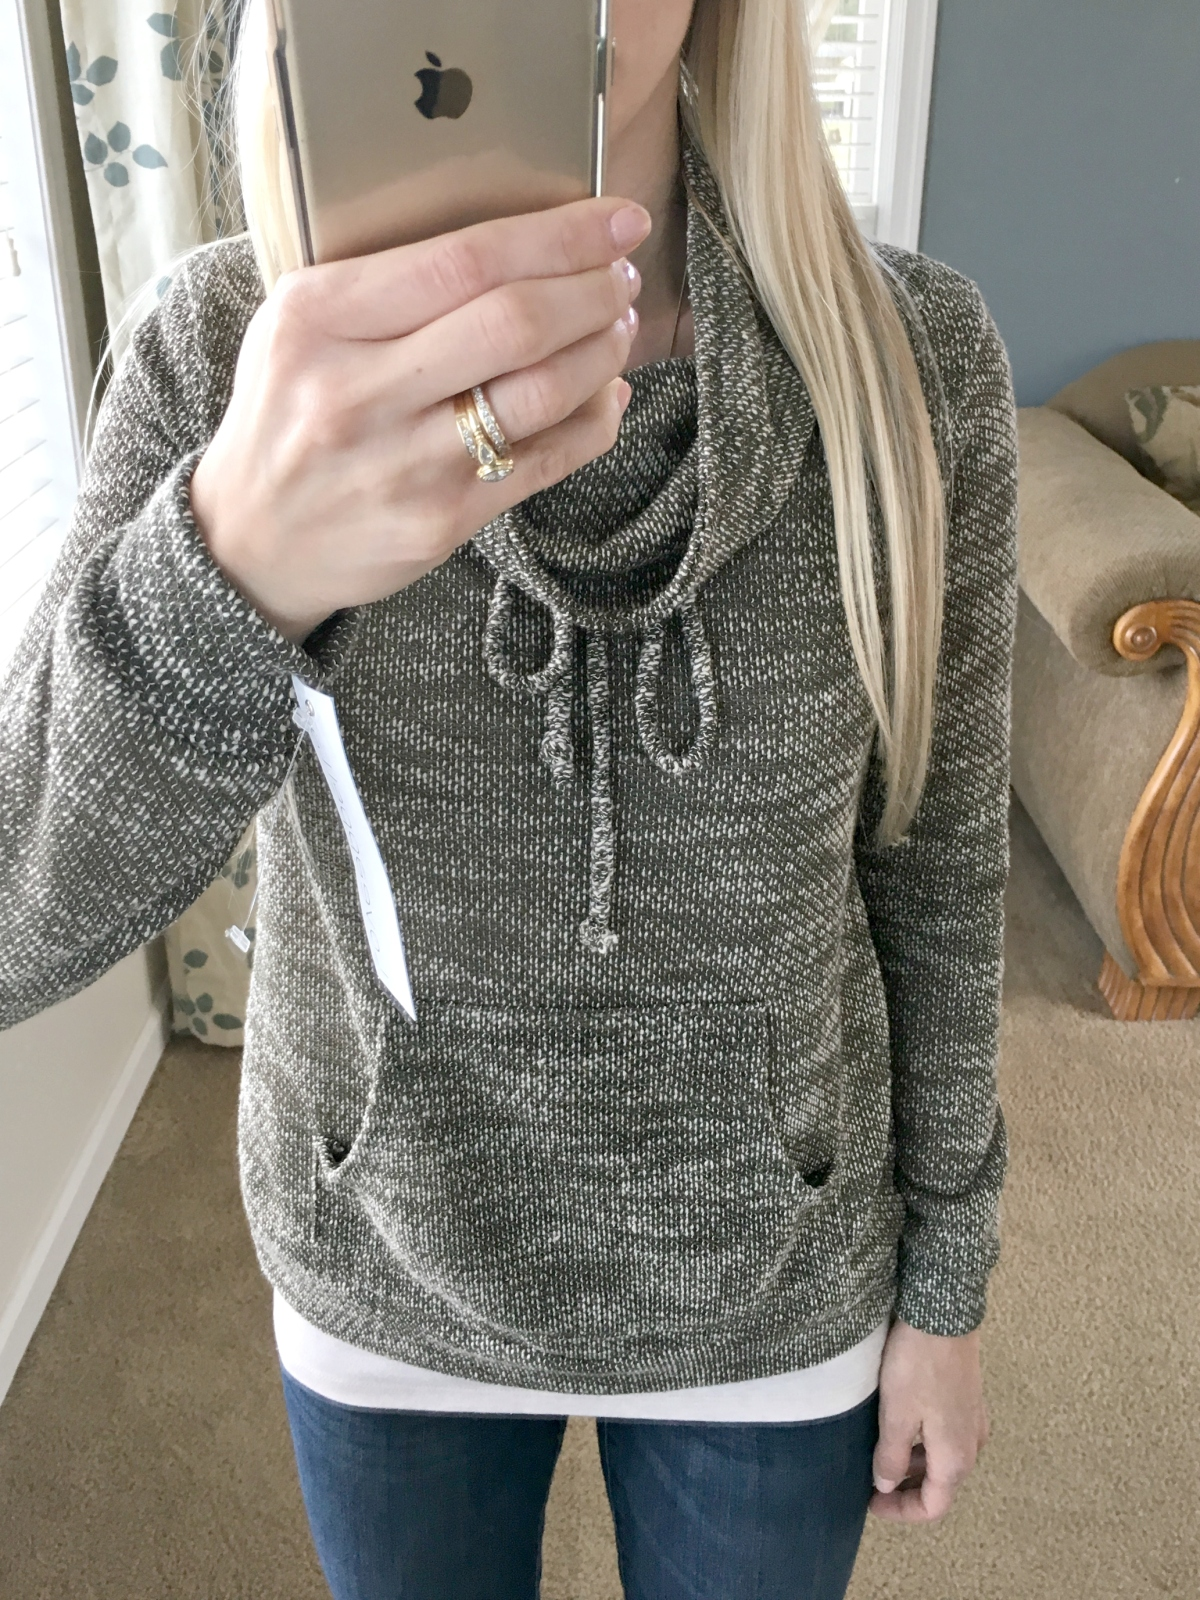 Loveappella Evie Draw String Funnel Neck Sweatshirt: December 2015 Stitch Fix Review |www.pearlsandsportsbras.com|